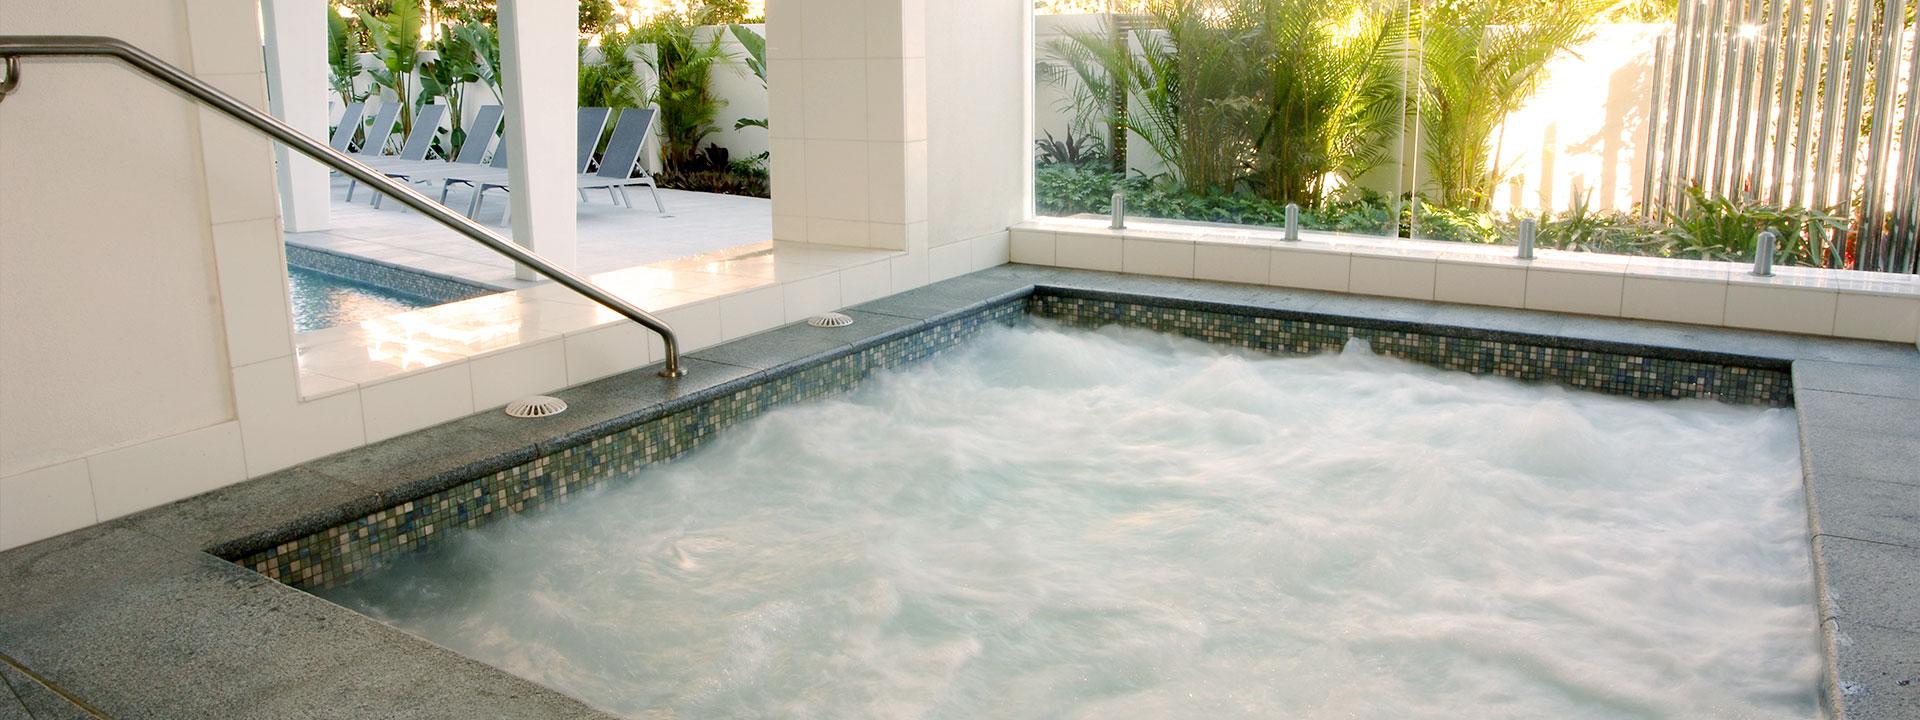 Artique Resort - Spa & Sauna